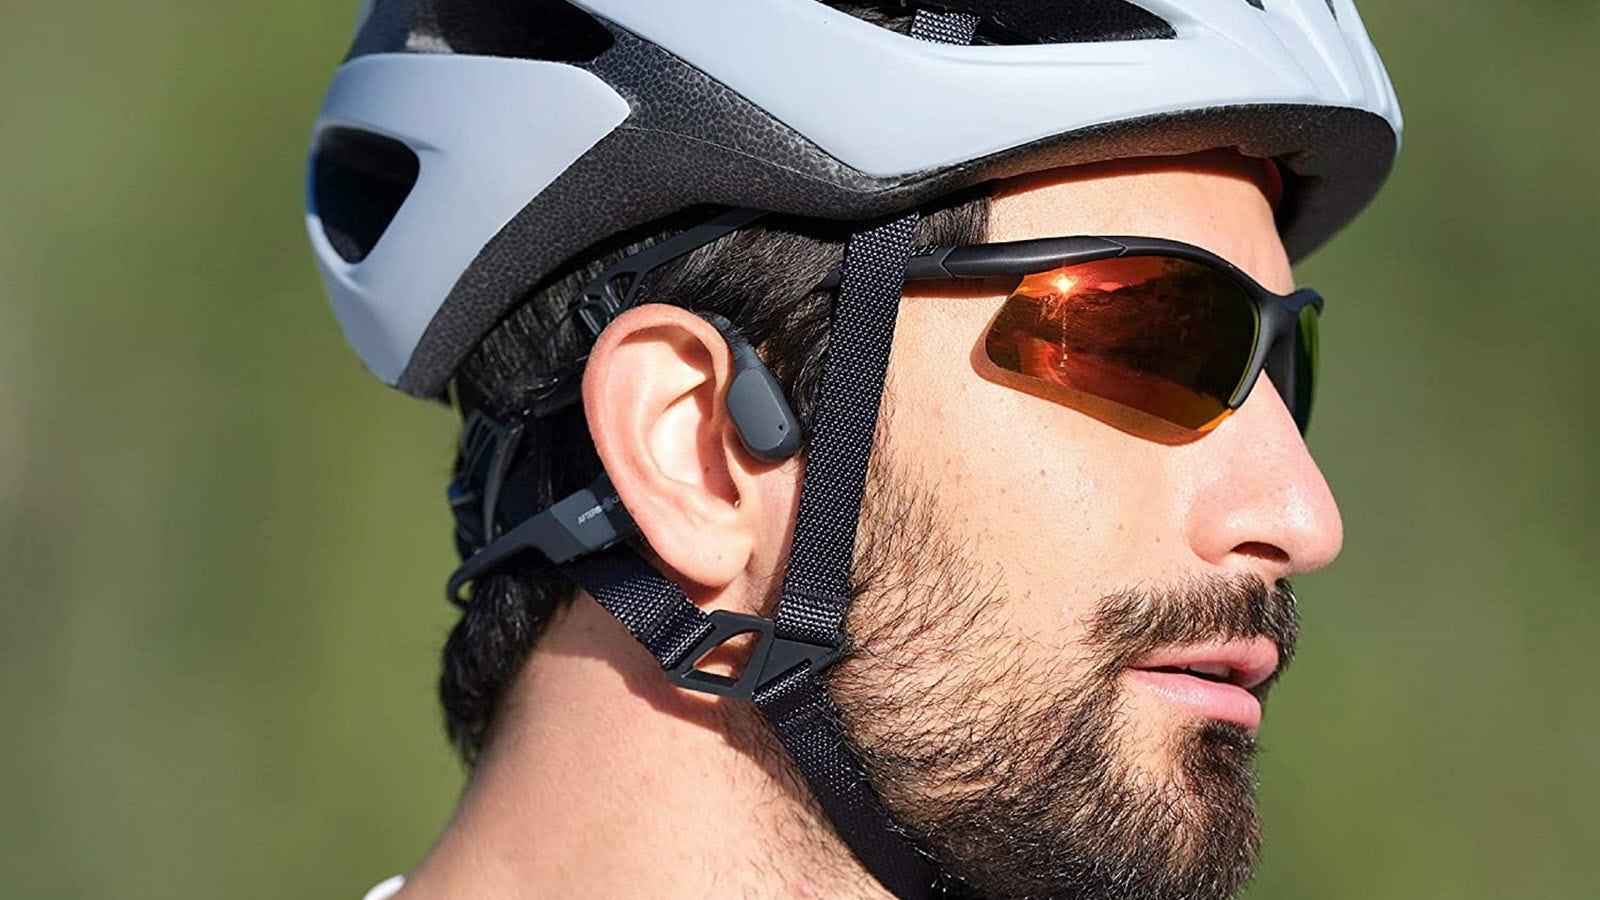 A man wearing the AfterShokz Mini headphones and a bike helmet.